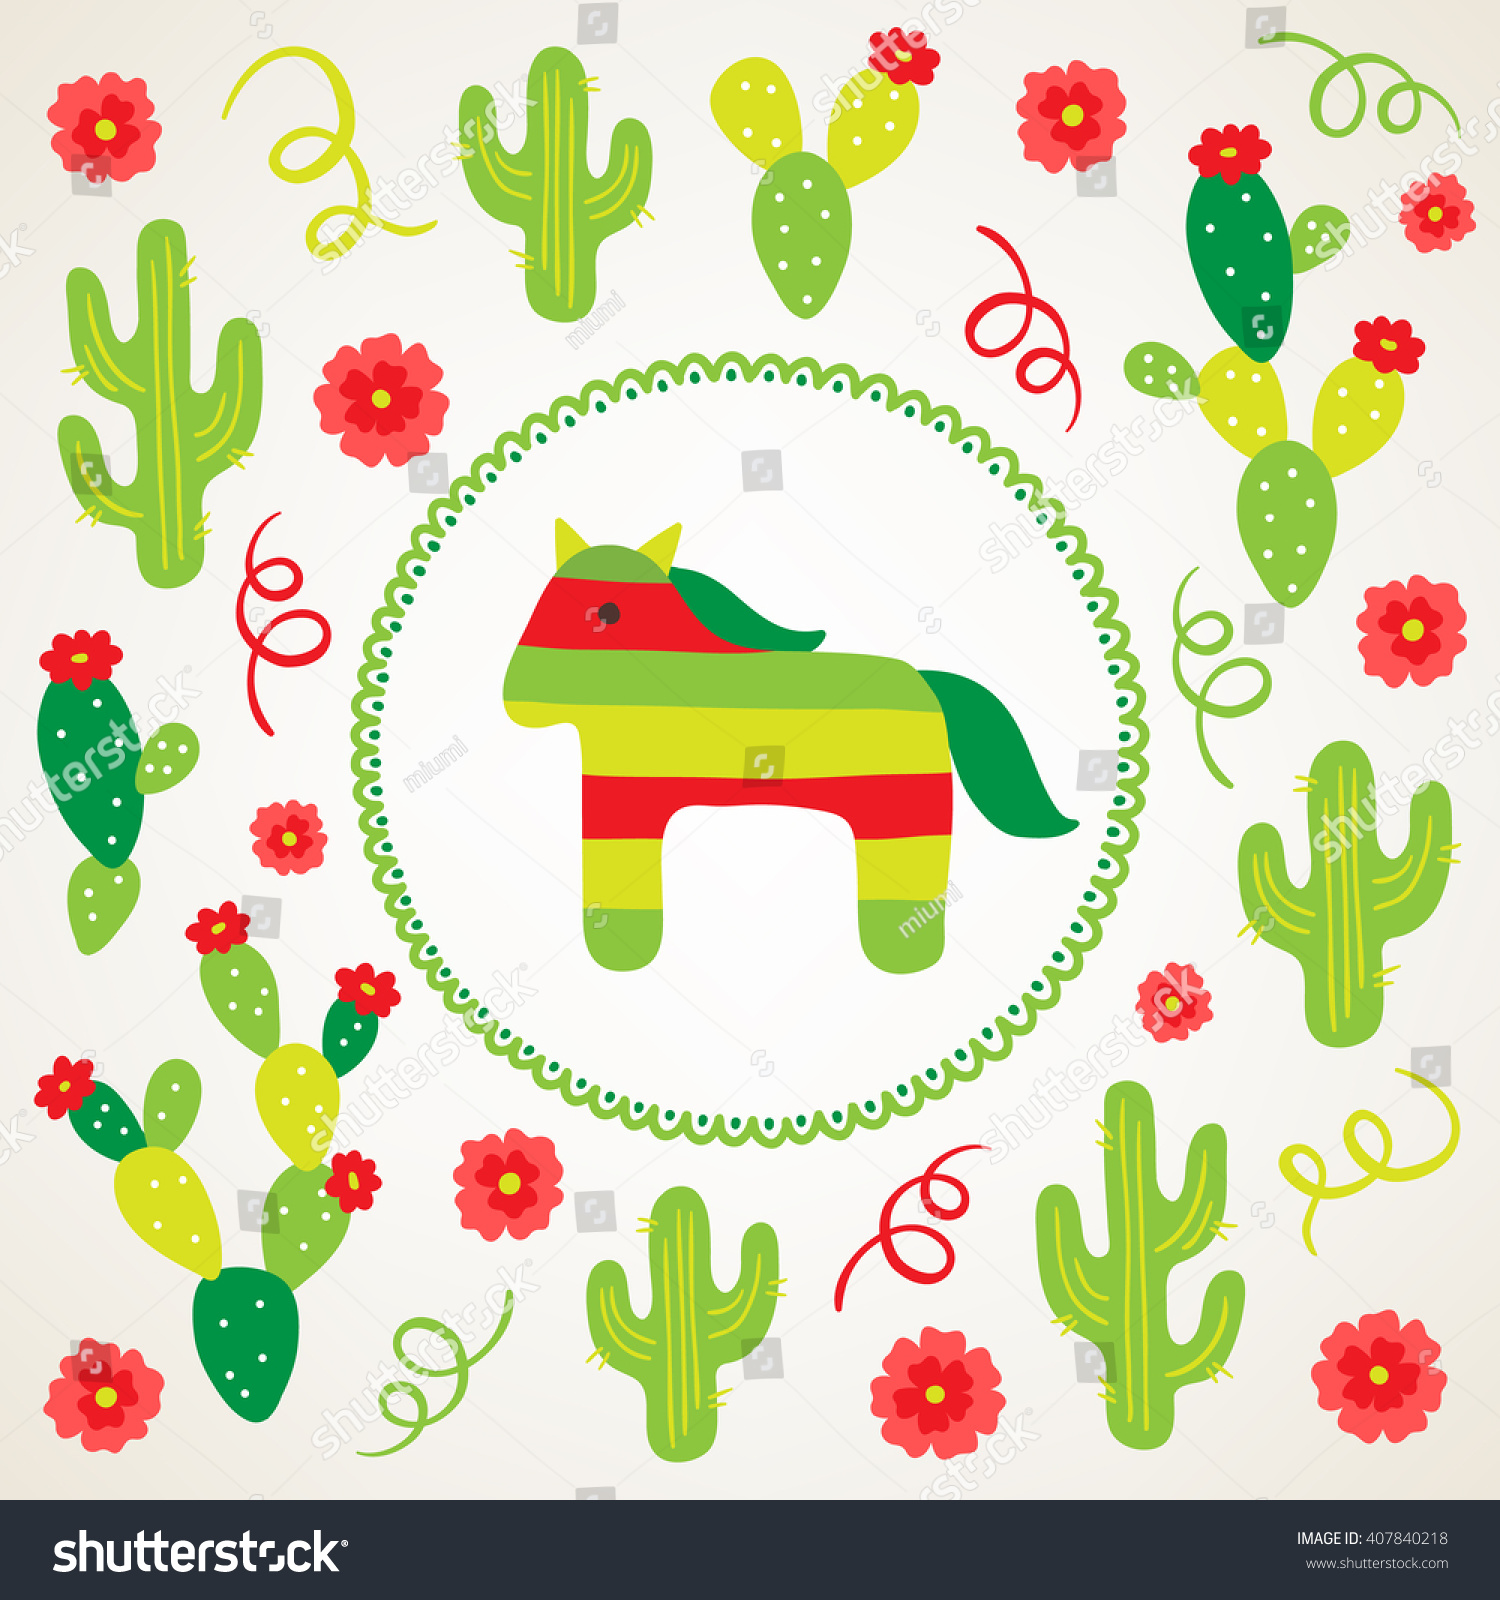 Cinco de mayo fifth may greeting stock vector 407840218 shutterstock cinco de mayo fifth of may greeting card with cactus pinata flowers kristyandbryce Gallery